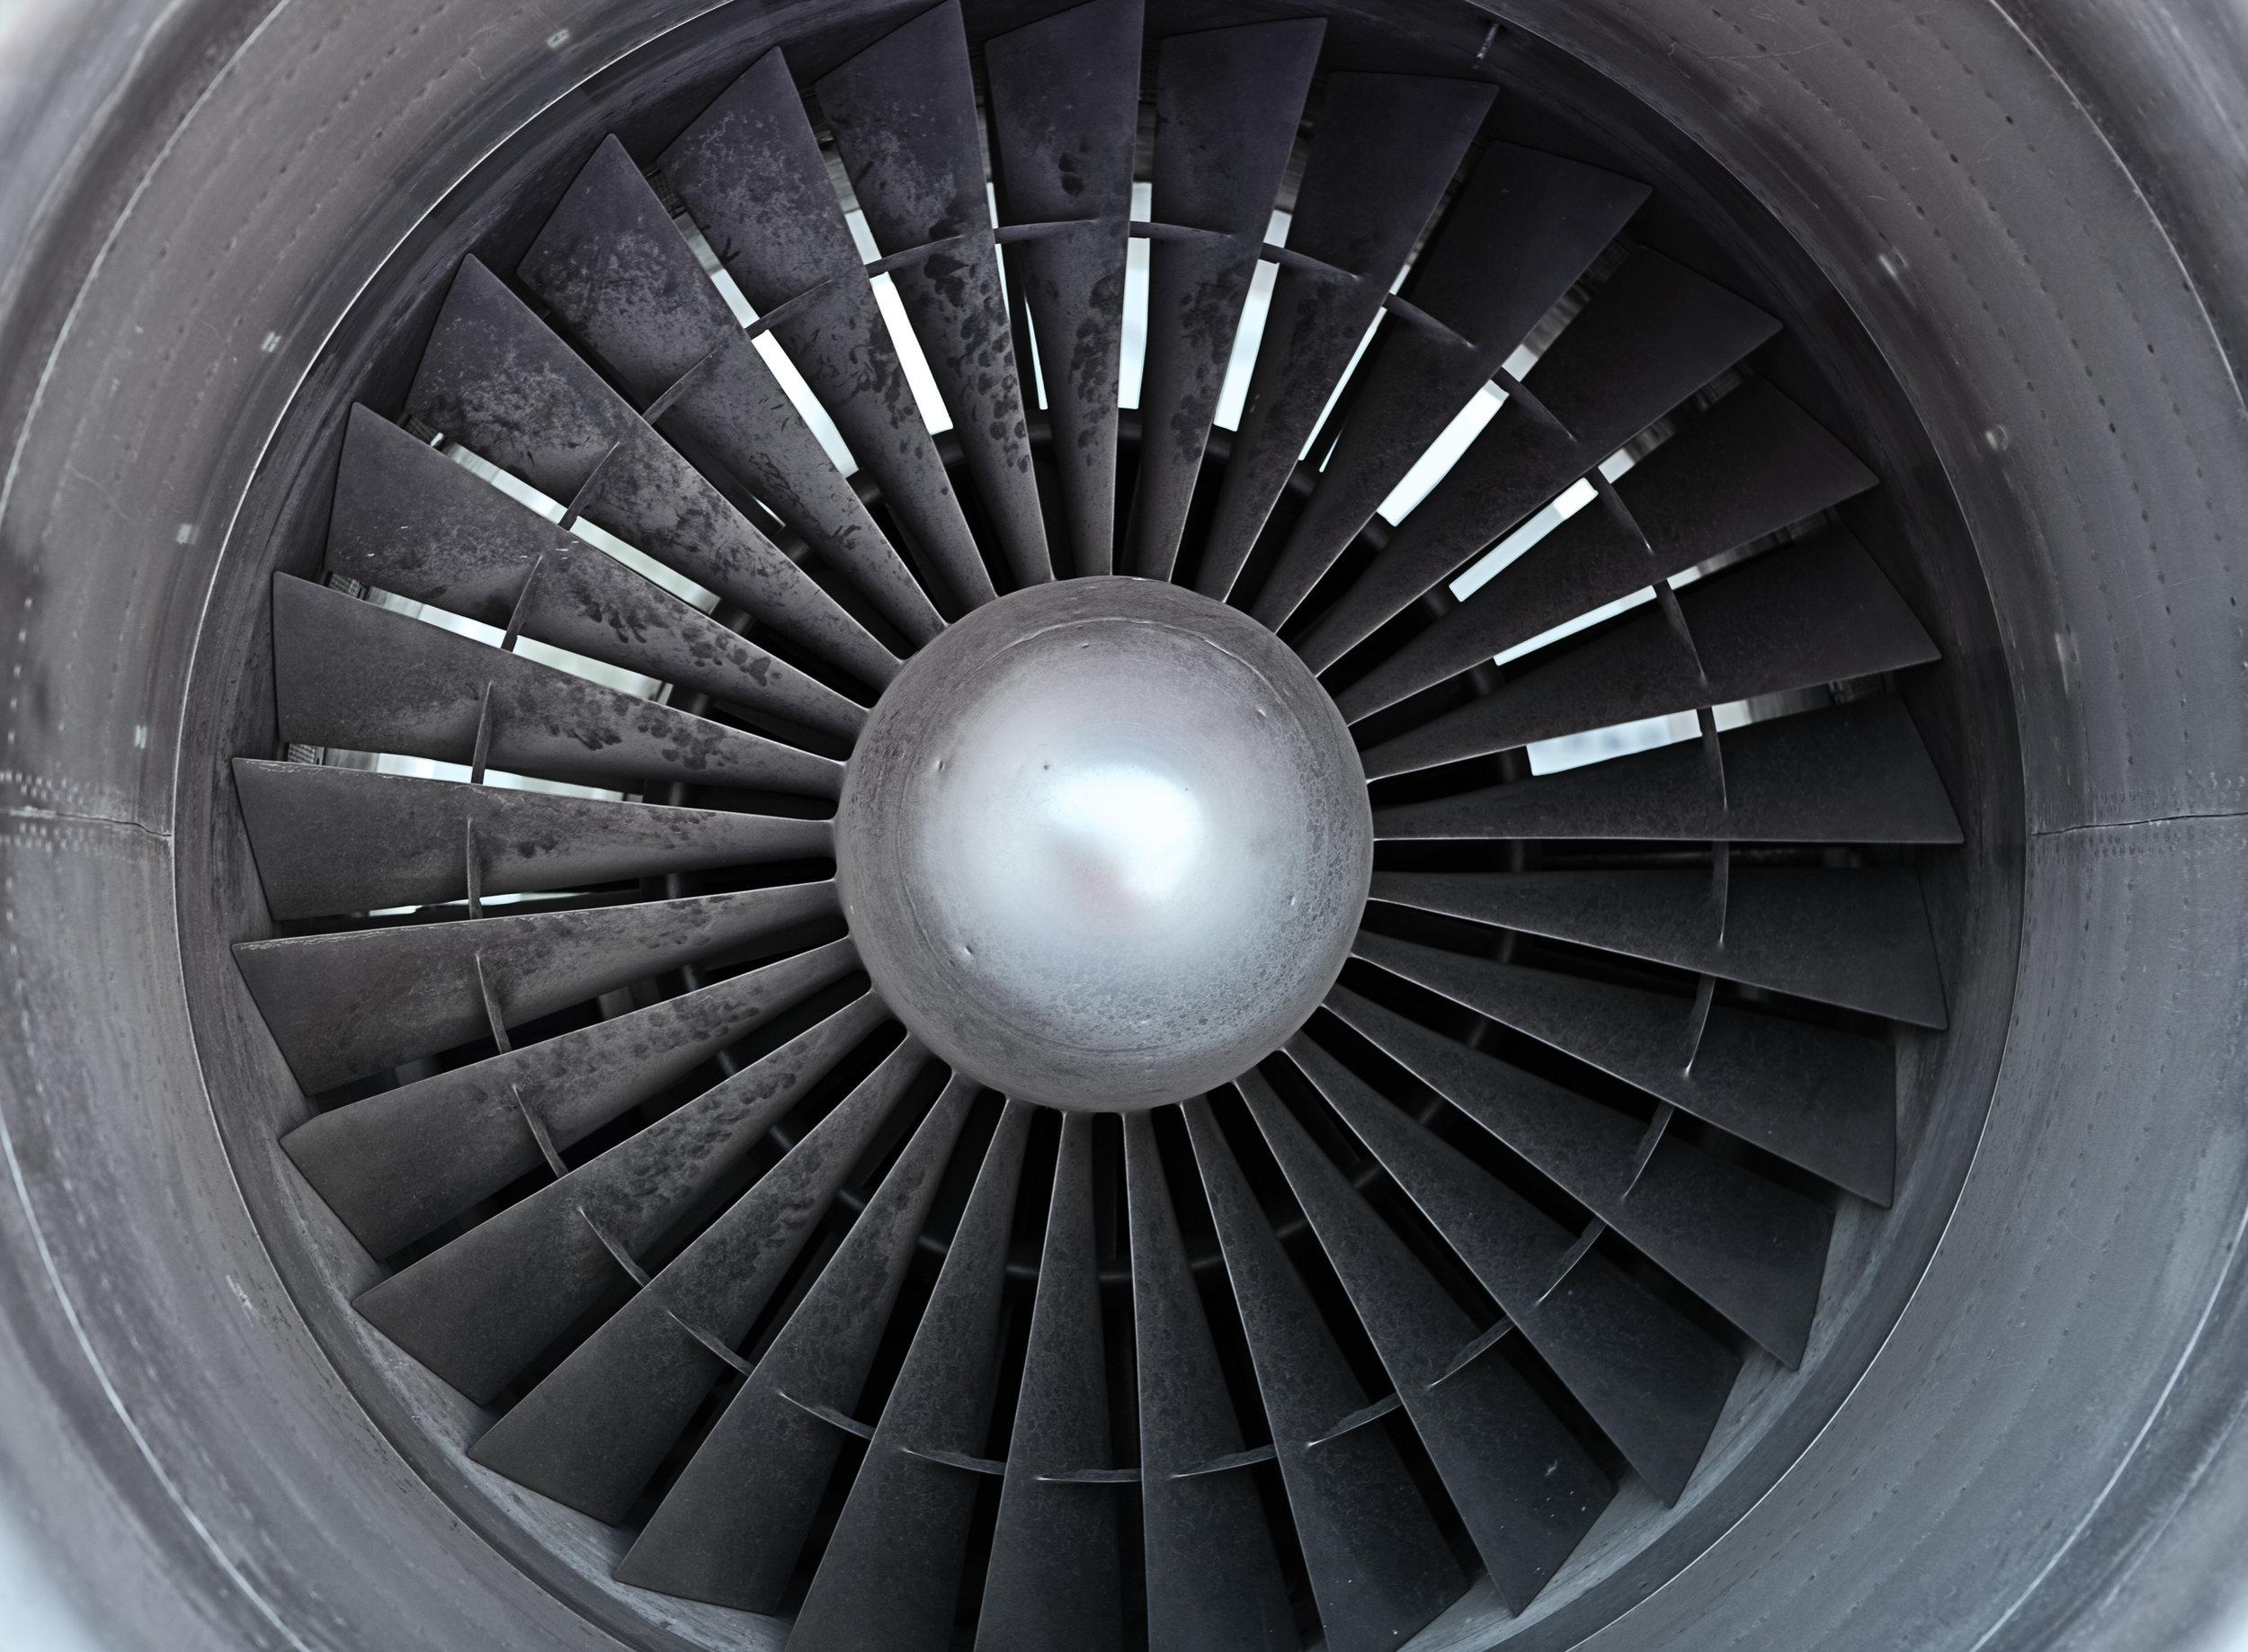 colourbox4709547-flyturbin.jpg